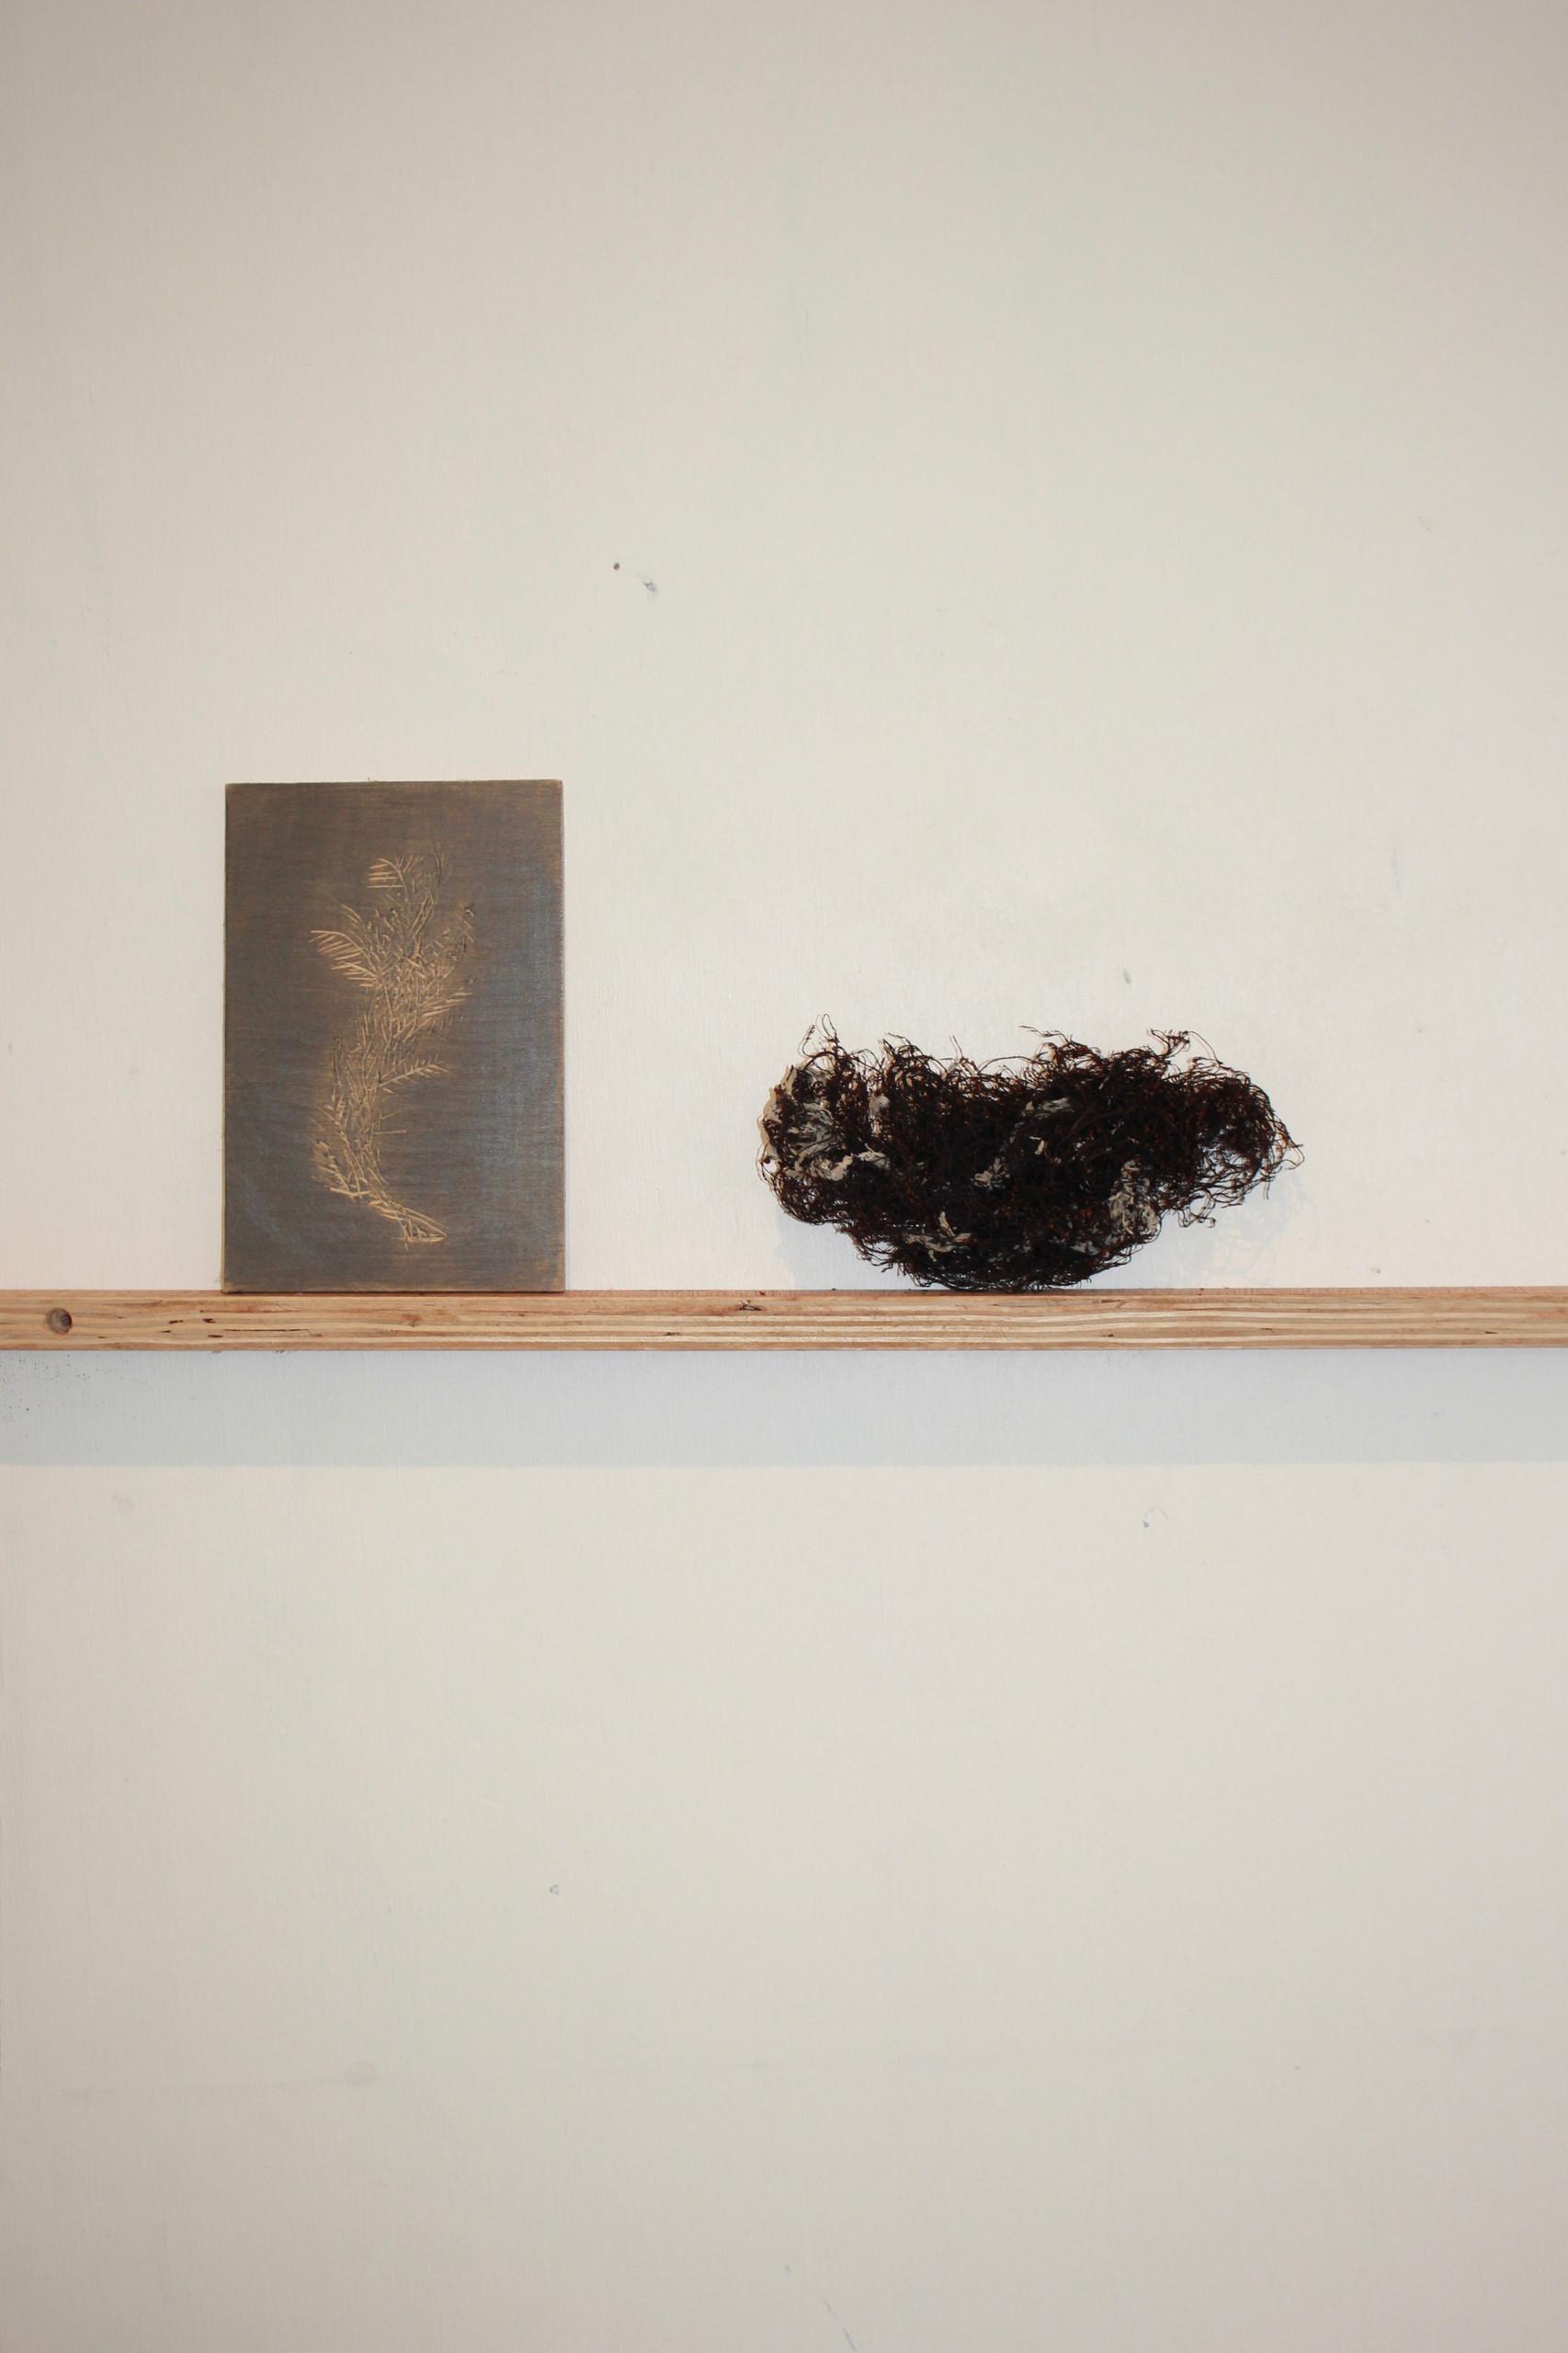 graphite on woodblock seaweed